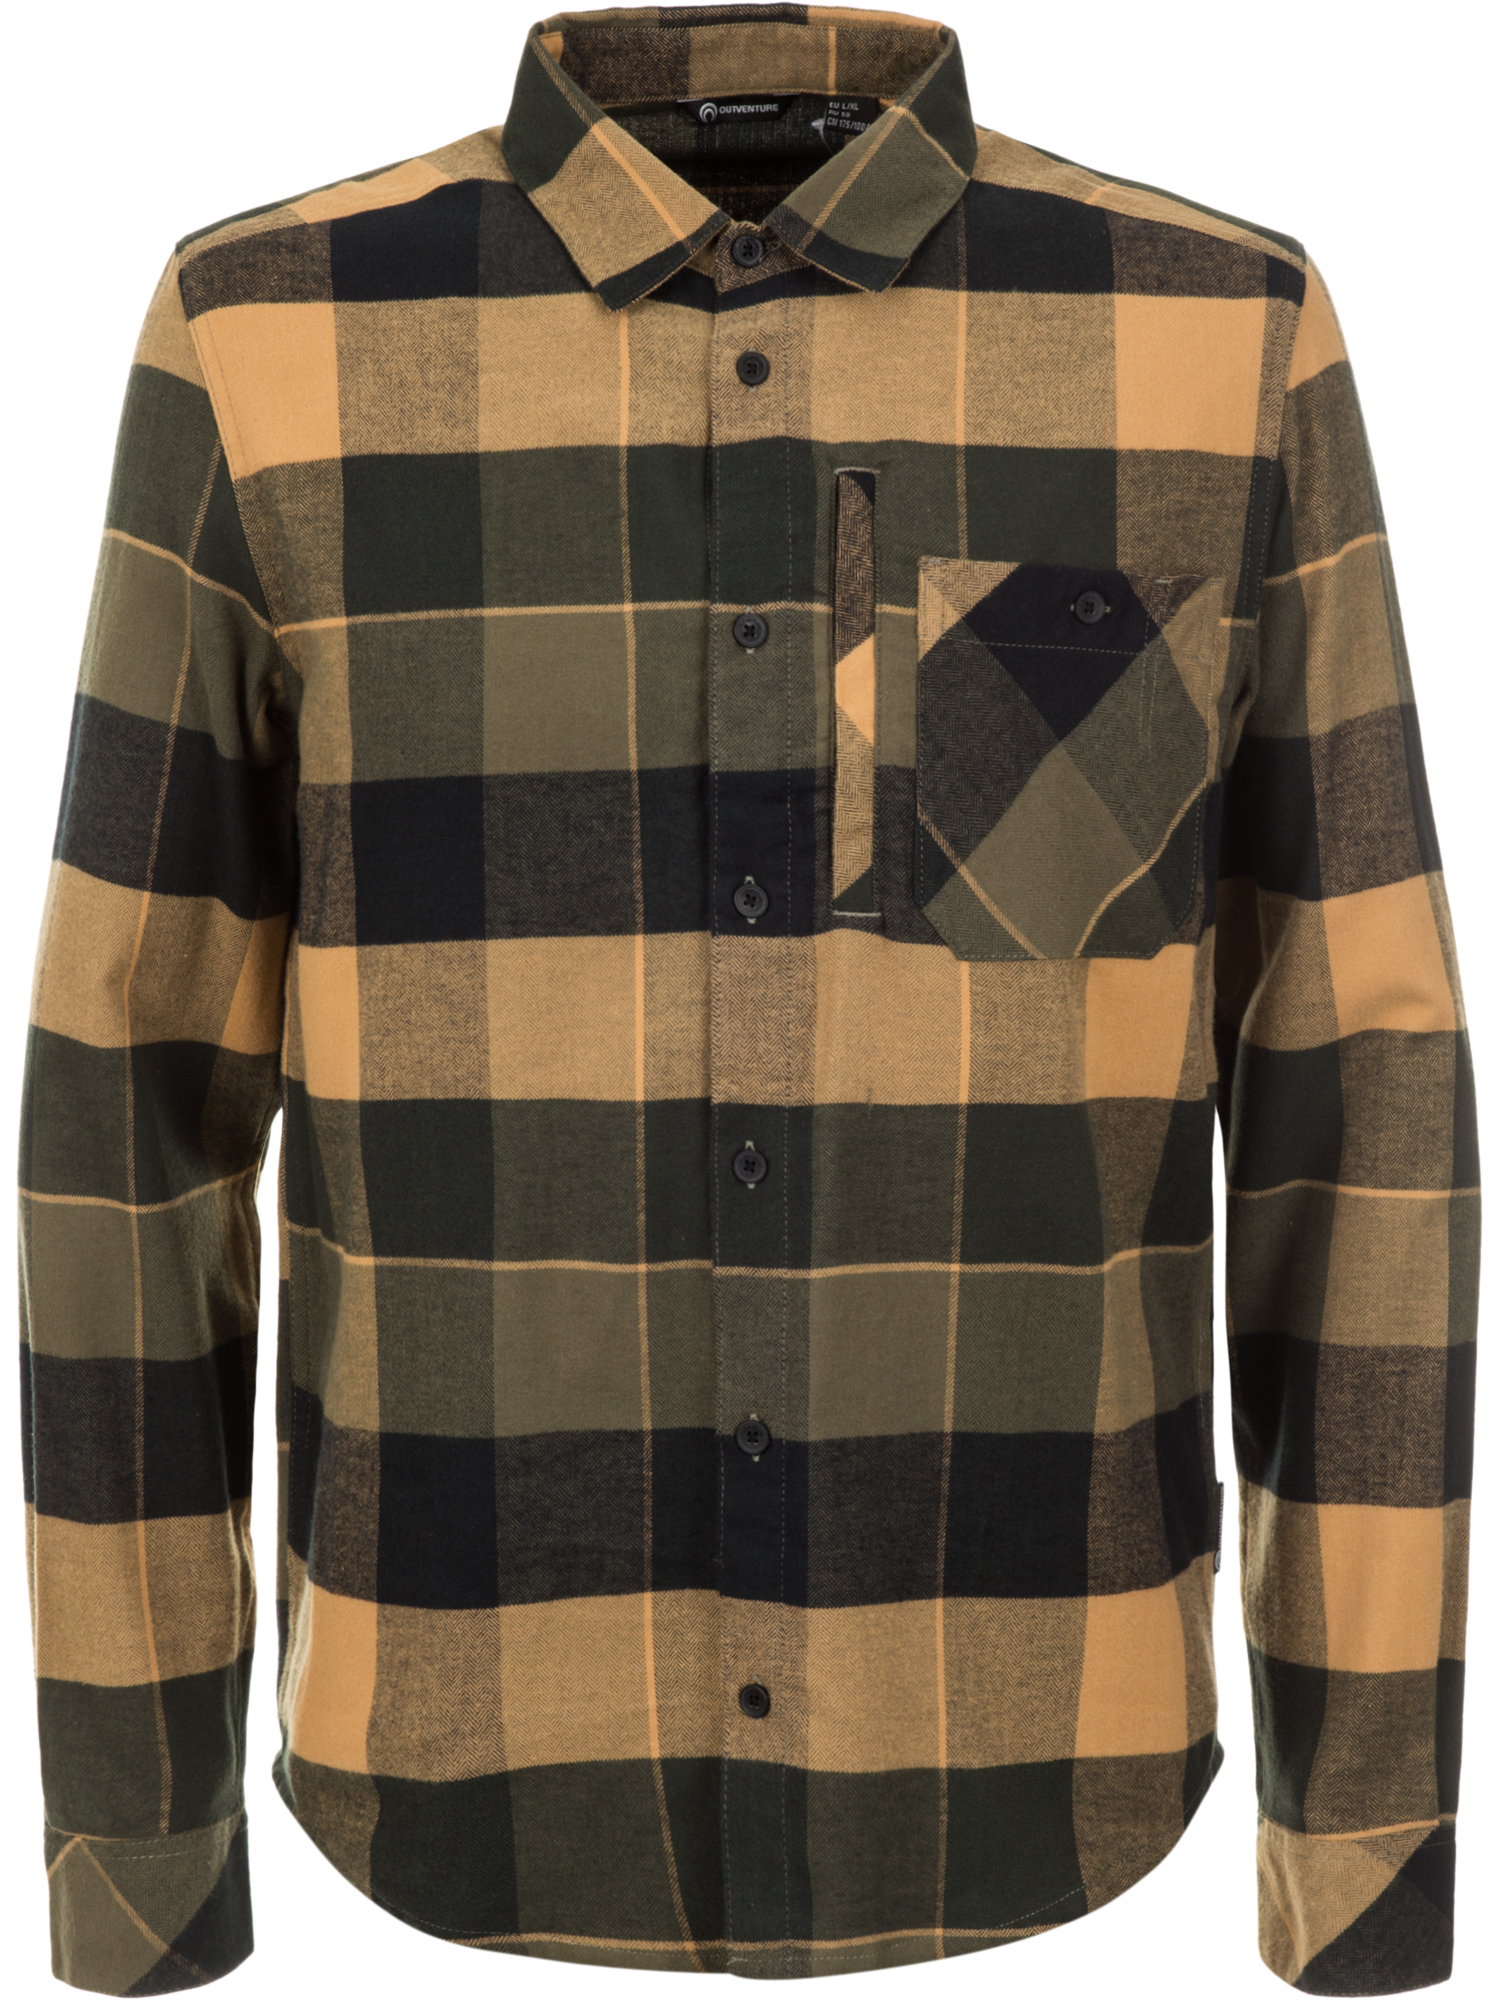 Outventure Рубашка с длинным рукавом мужская Outventure, размер 58